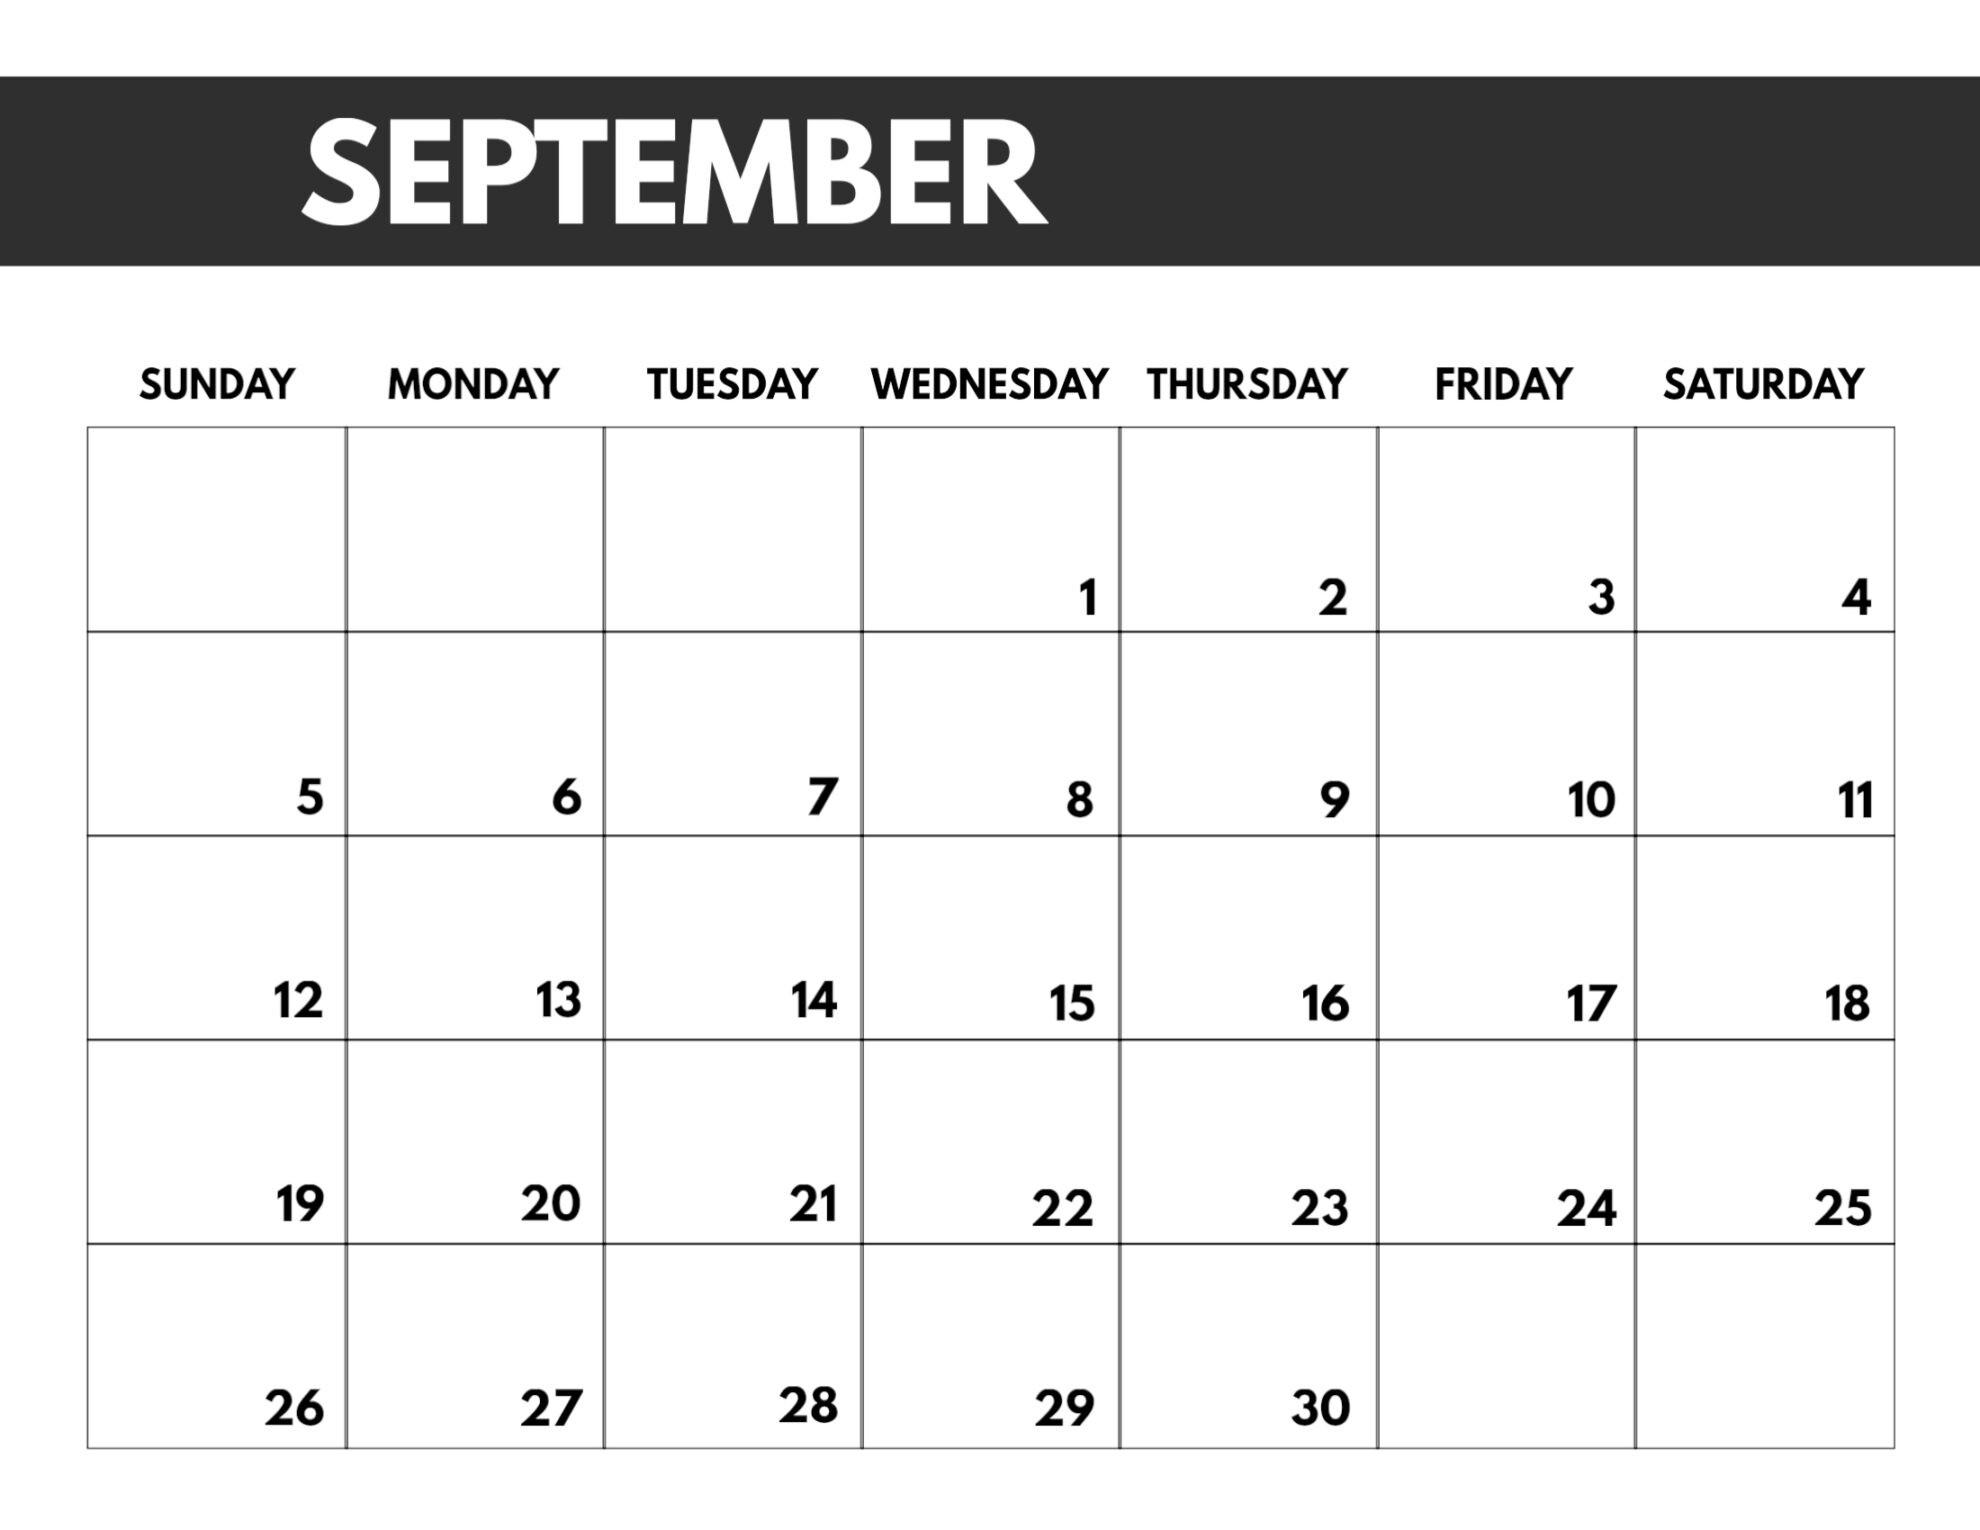 2021 Free Monthly Calendar Templates | Paper Trail Design-Calander 2021 June For Bills